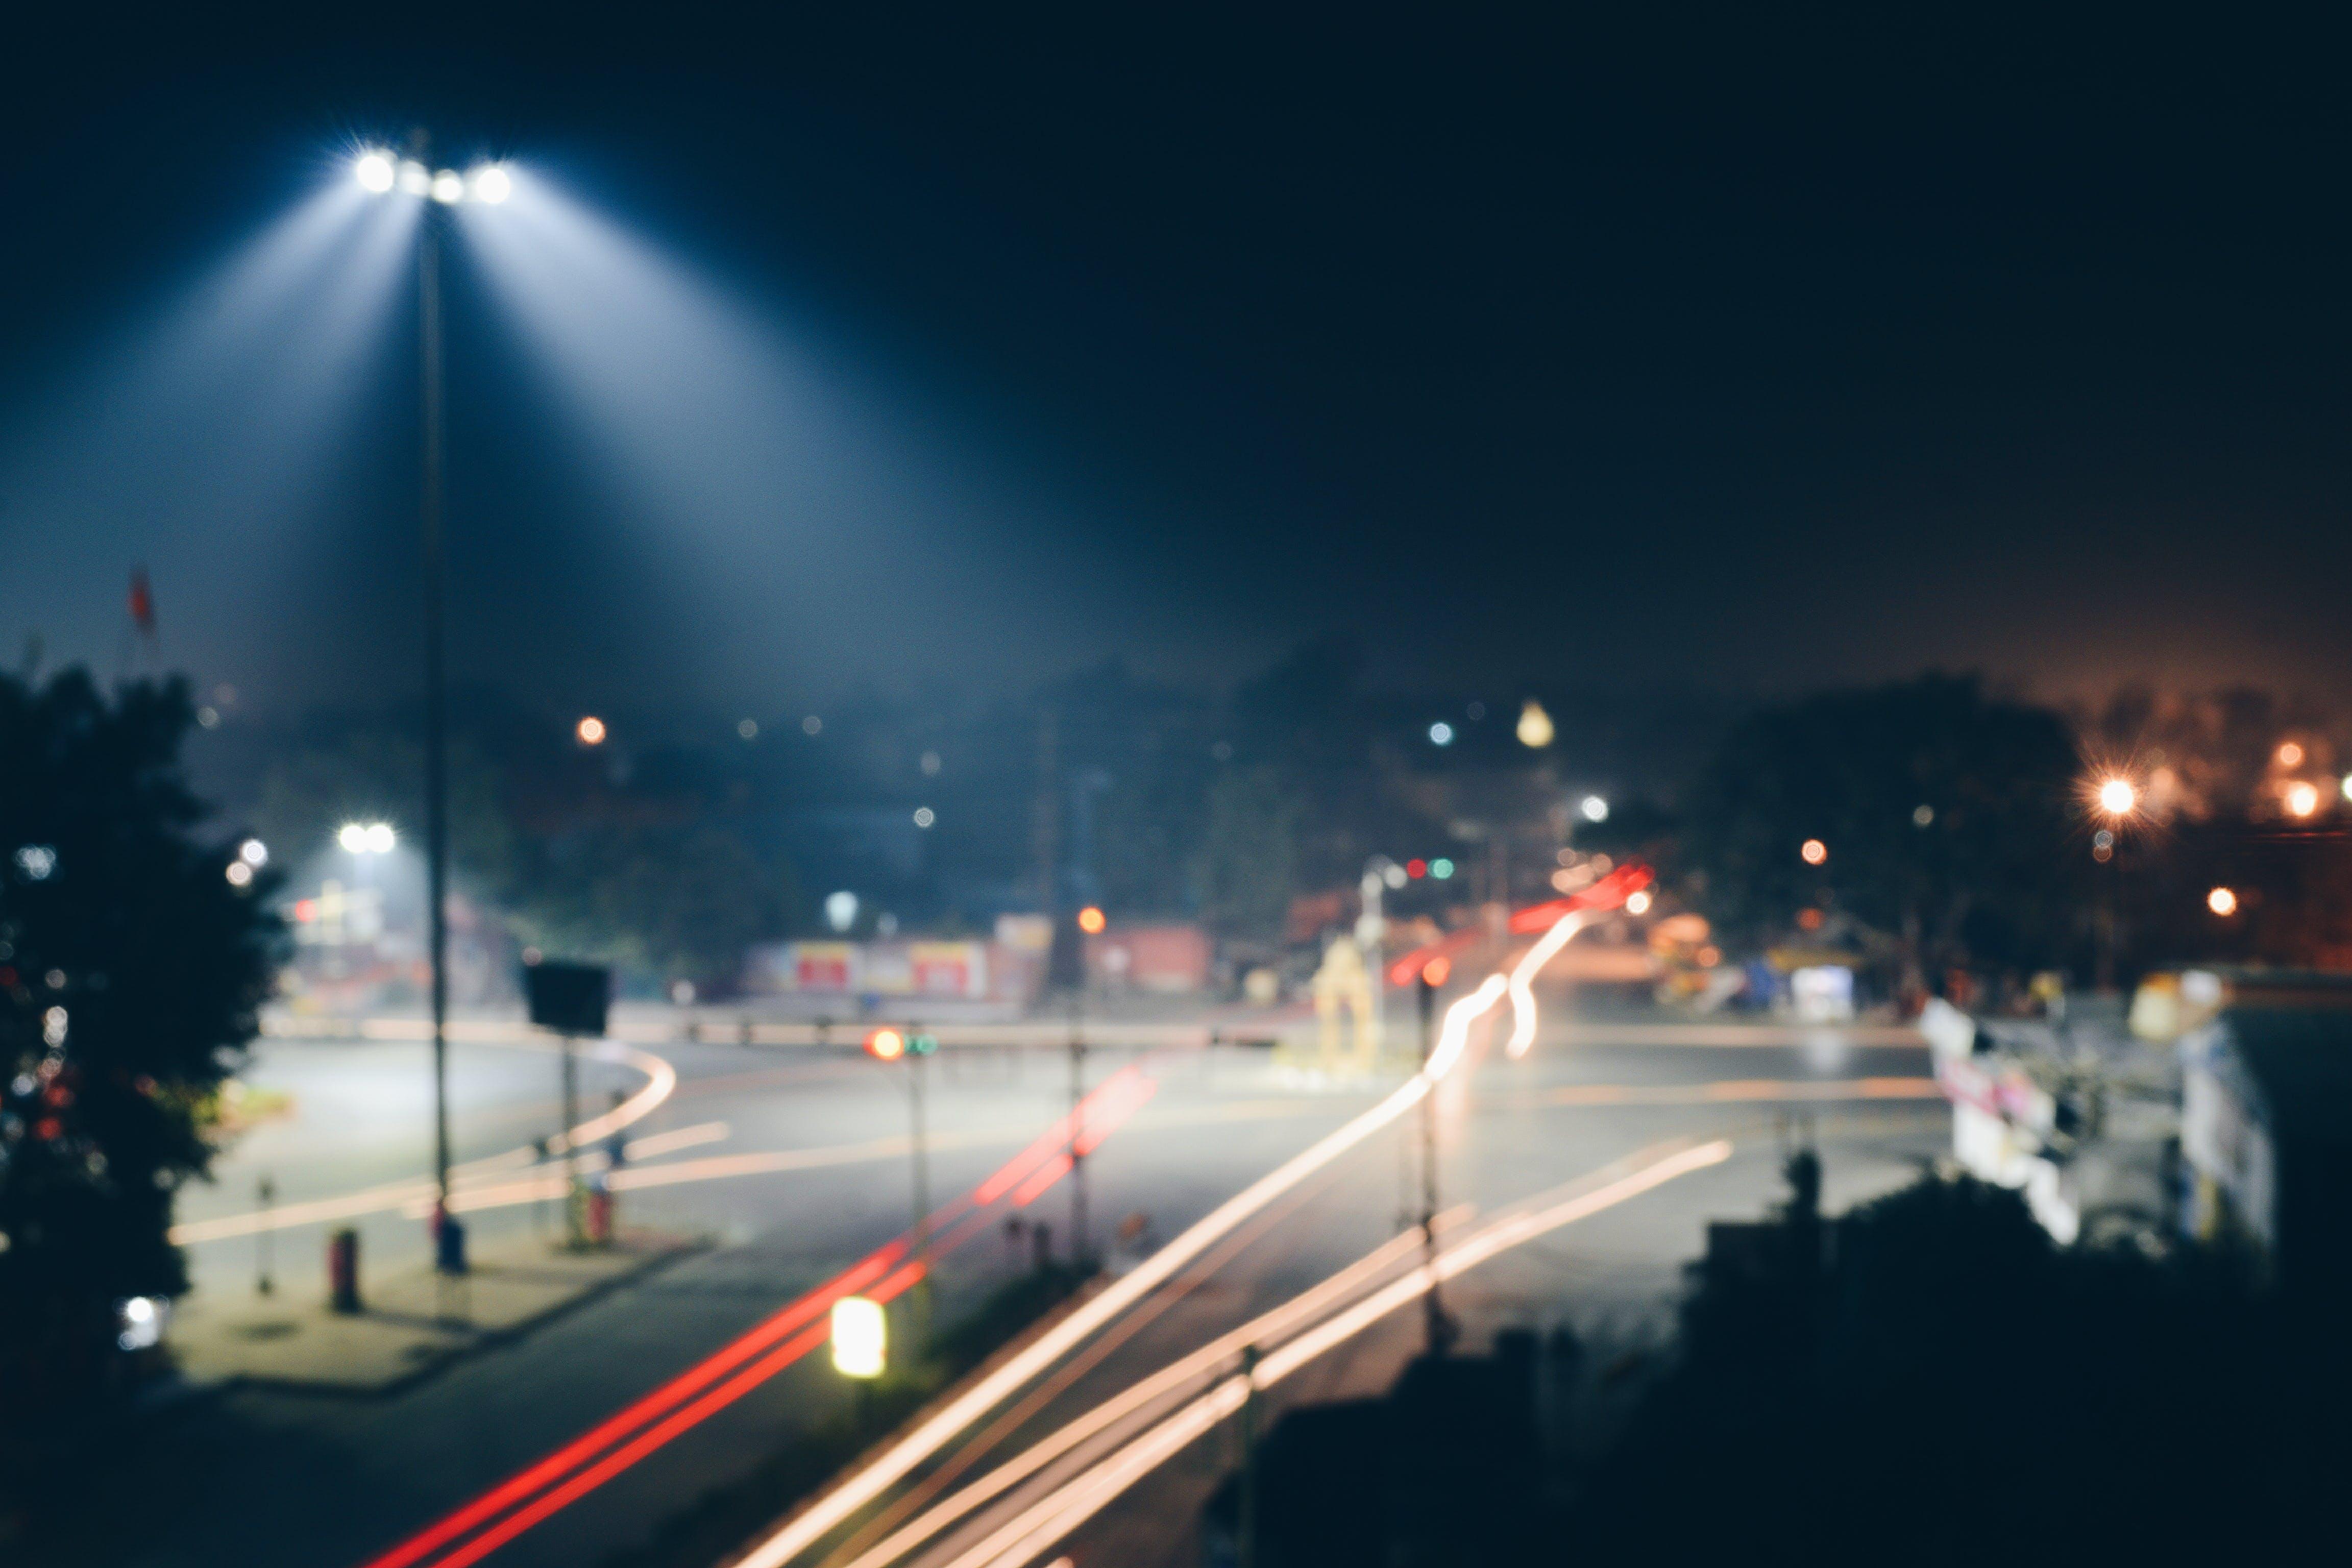 Gratis arkivbilde med asfalt, bevegelse, biler, billys